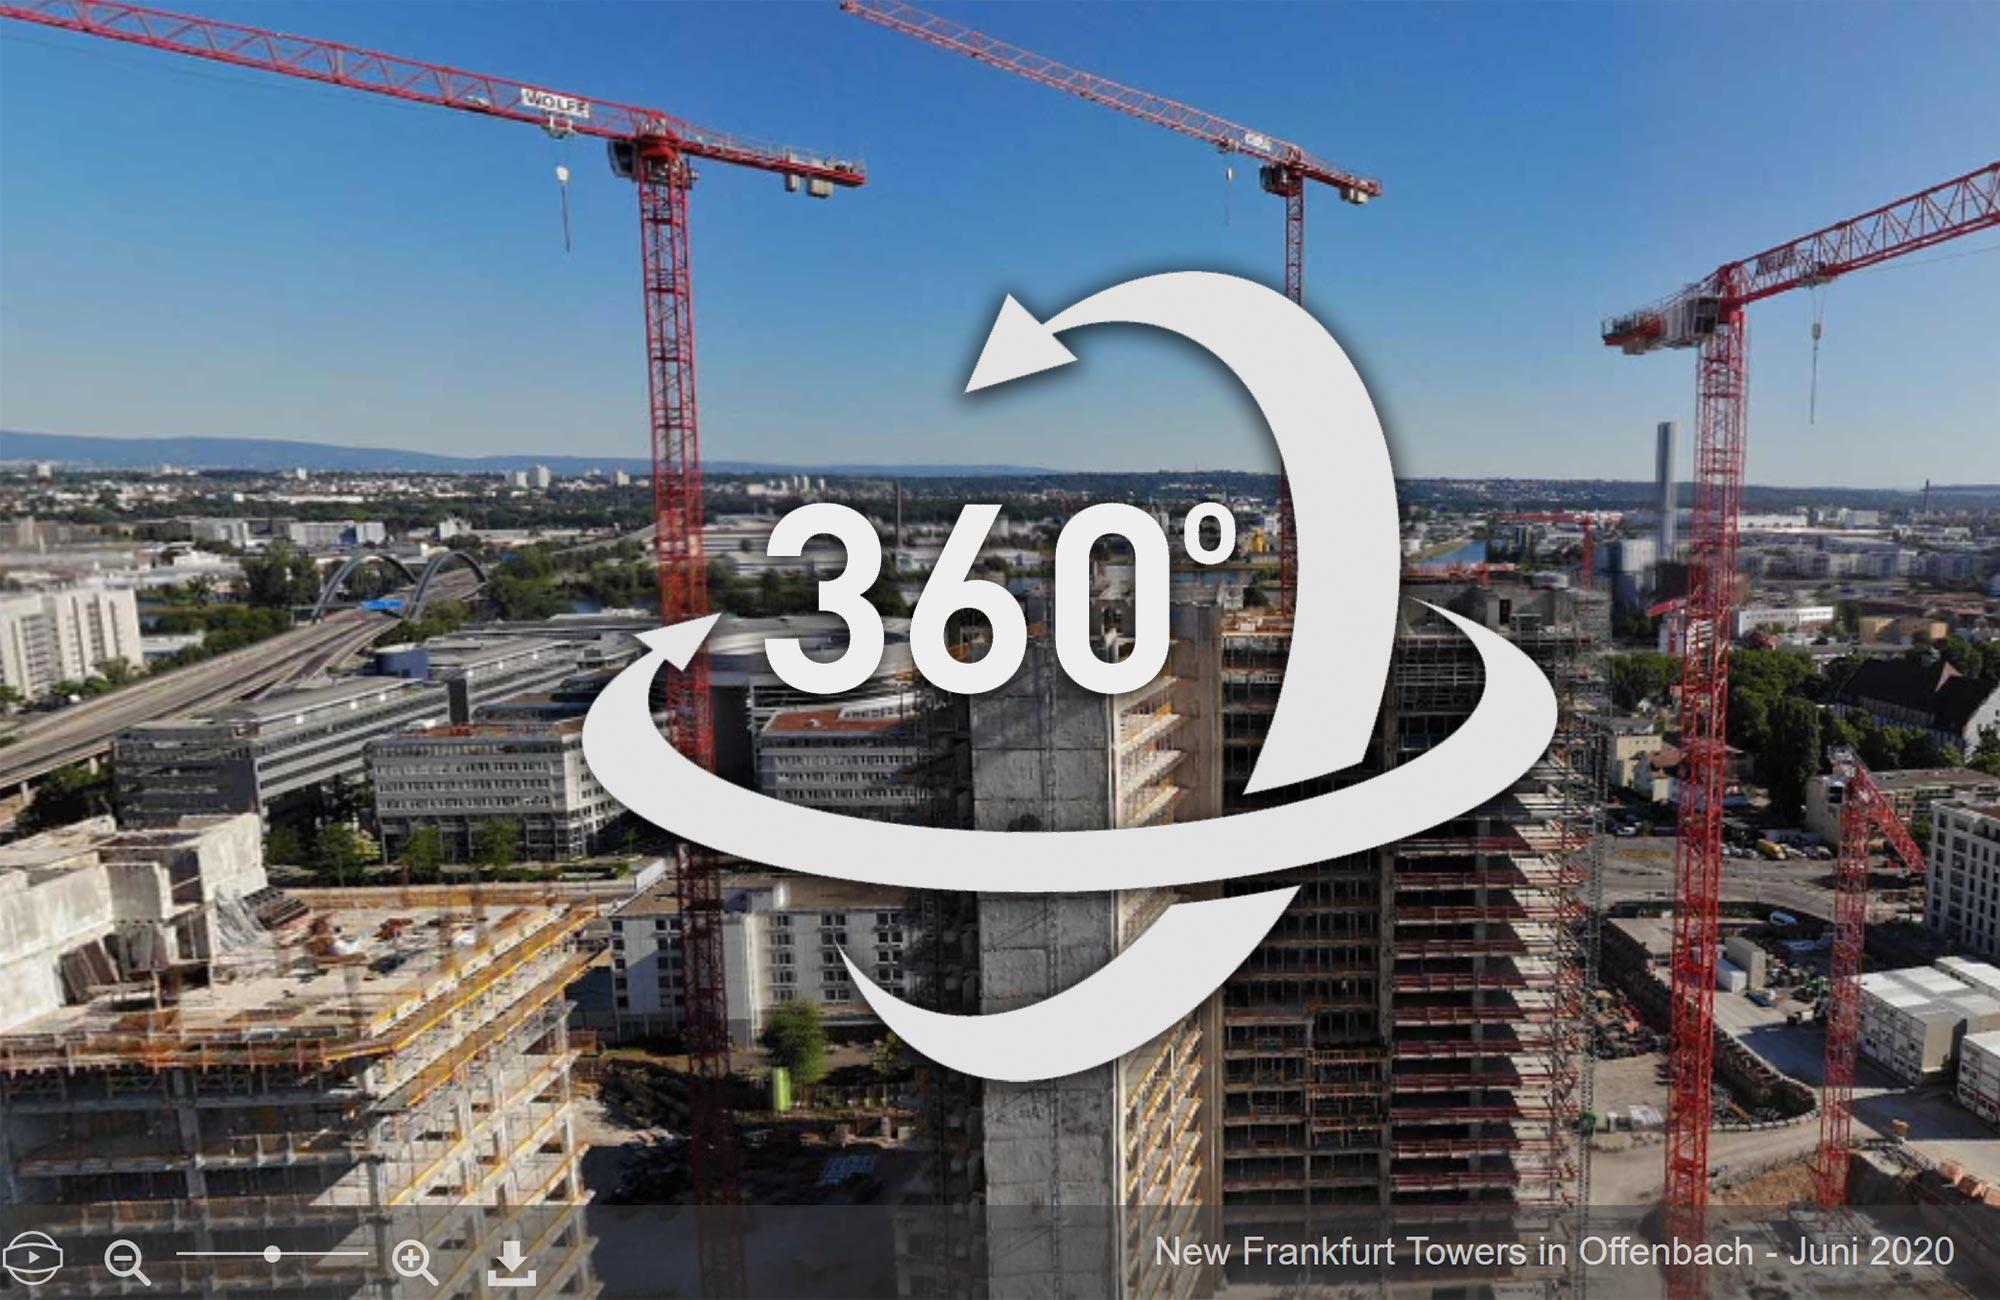 360 Grad Luftaufnahme Offenbach - Frankfurt - Kaiserlei - Panoramaaufnahme Rundumsicht Kugelpanorama mit Drohne